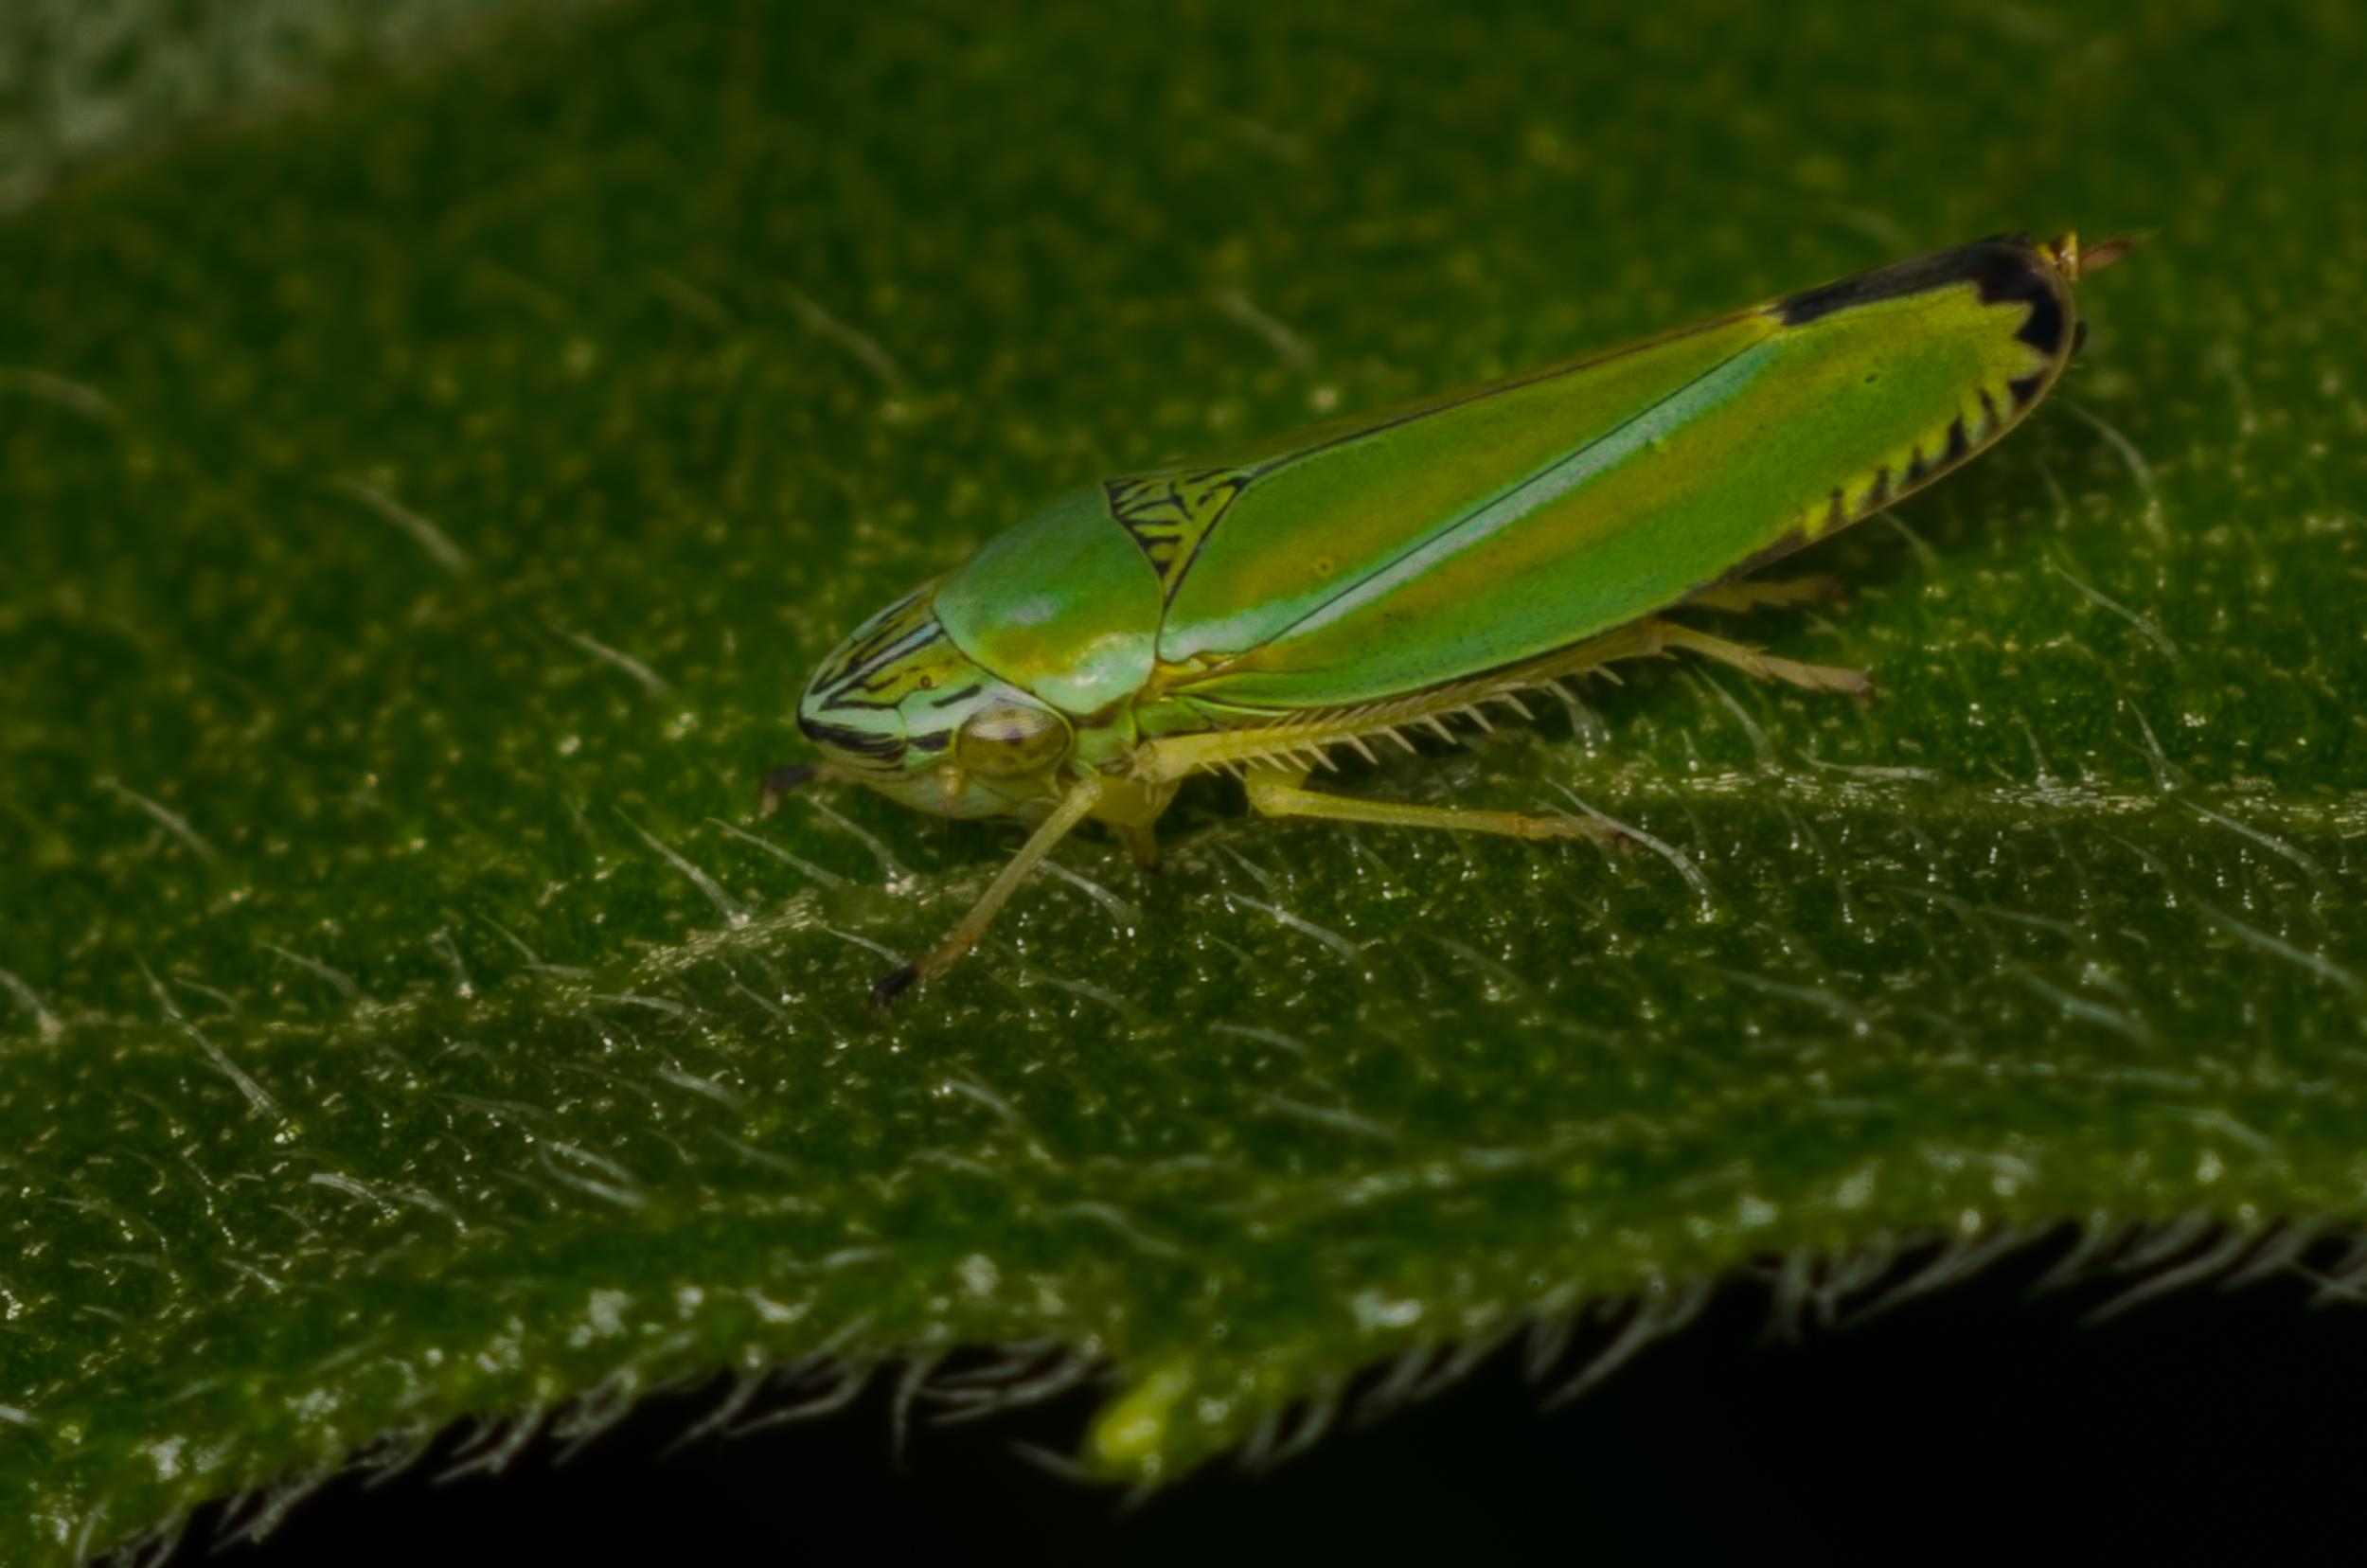 Leaf Hopper (   Graphocephala versuta)  Nikon D7000 ISO 200 f/11 1/125 sec. and Nikkor 105mm f/4 Micro AI manual focus lens + 27mm + 20mm + 14mm + 12mm extension tubes, off-body flash with DIY diffuser